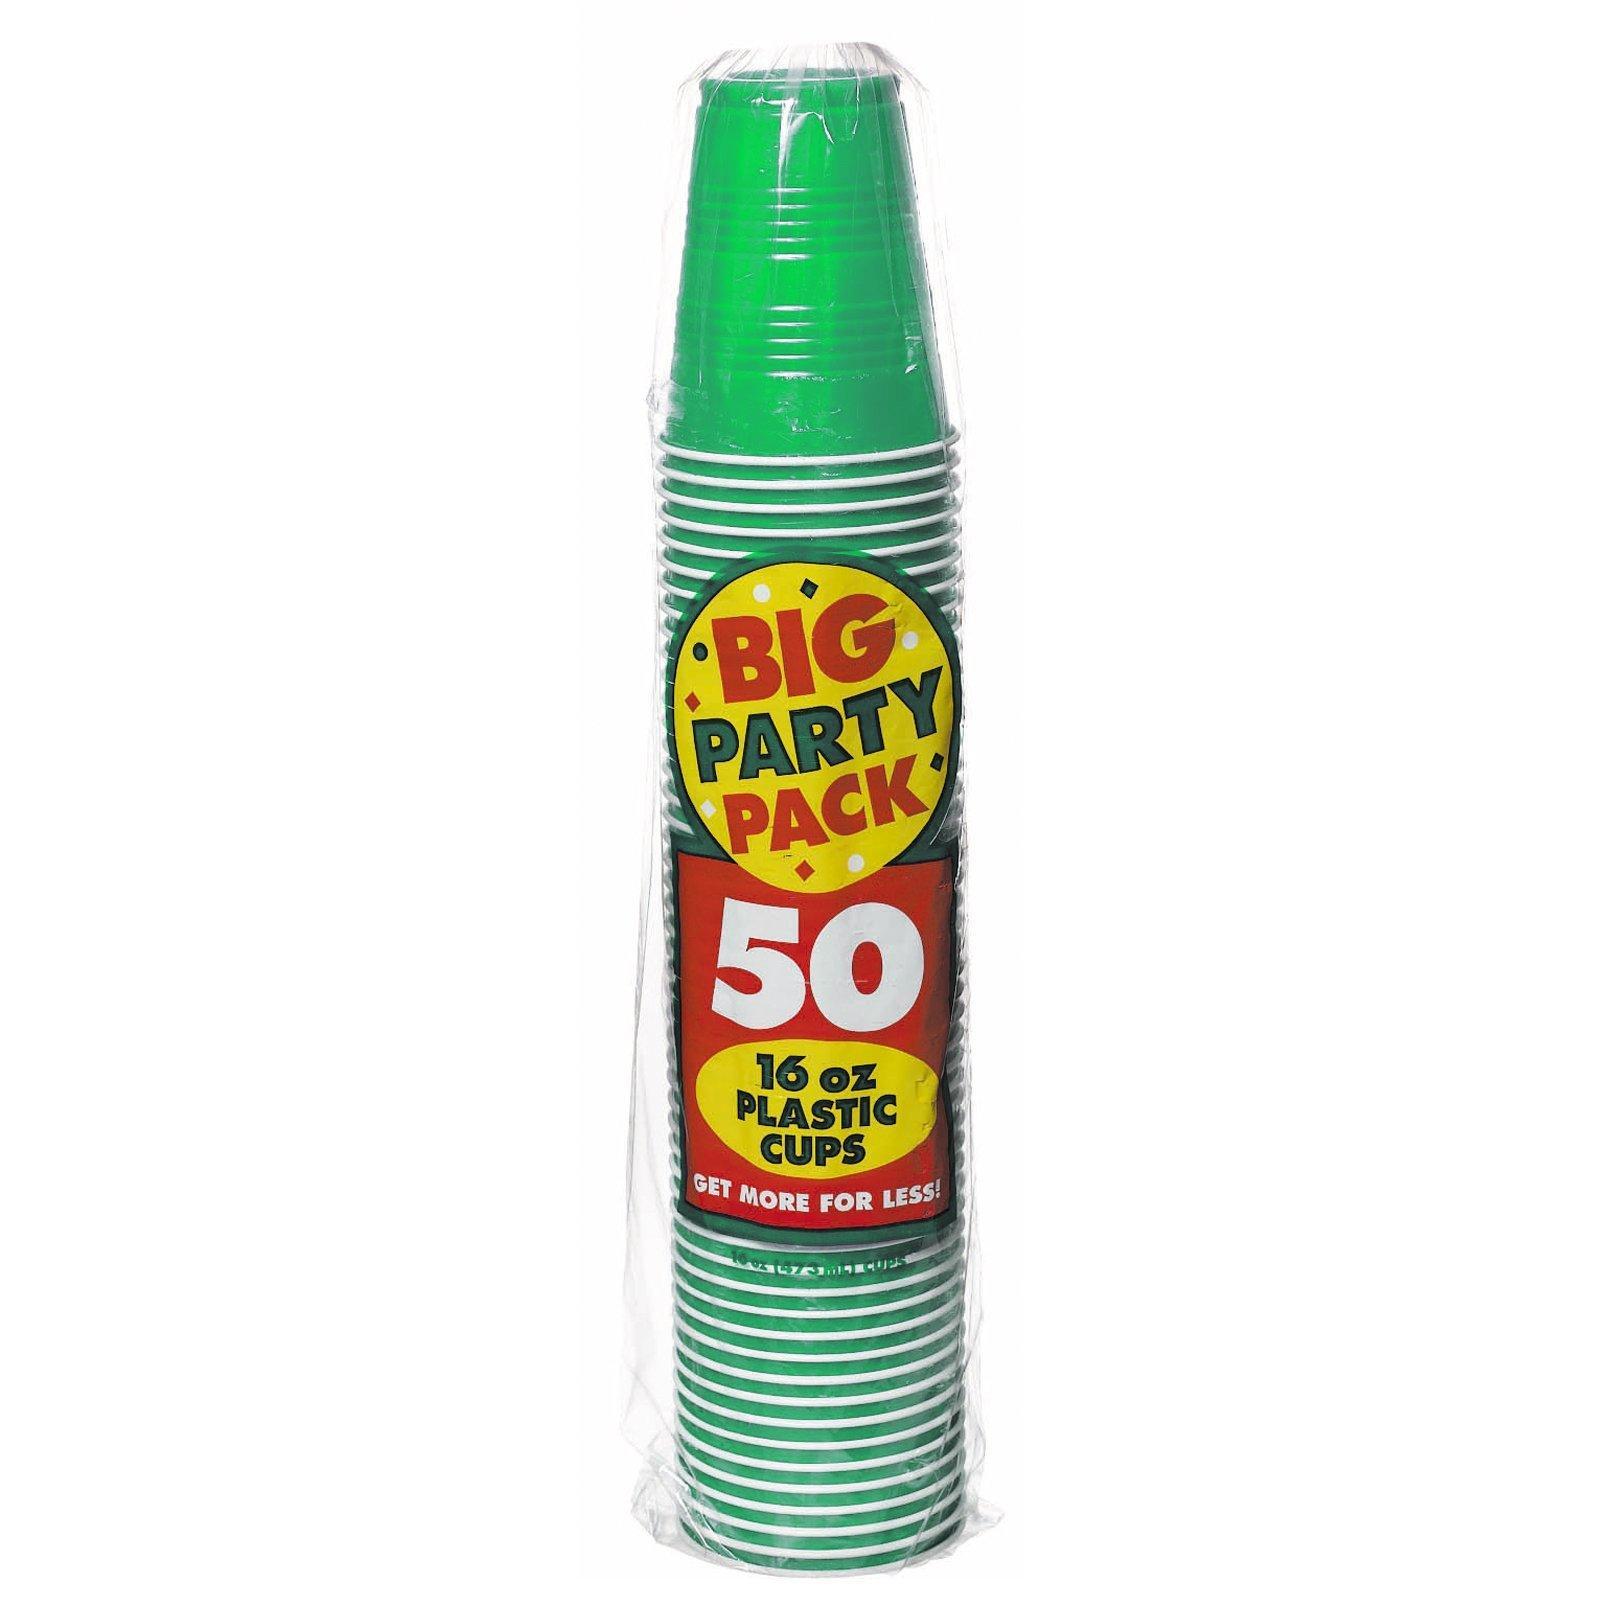 Big Party Pack 16 oz. Plastic Cups